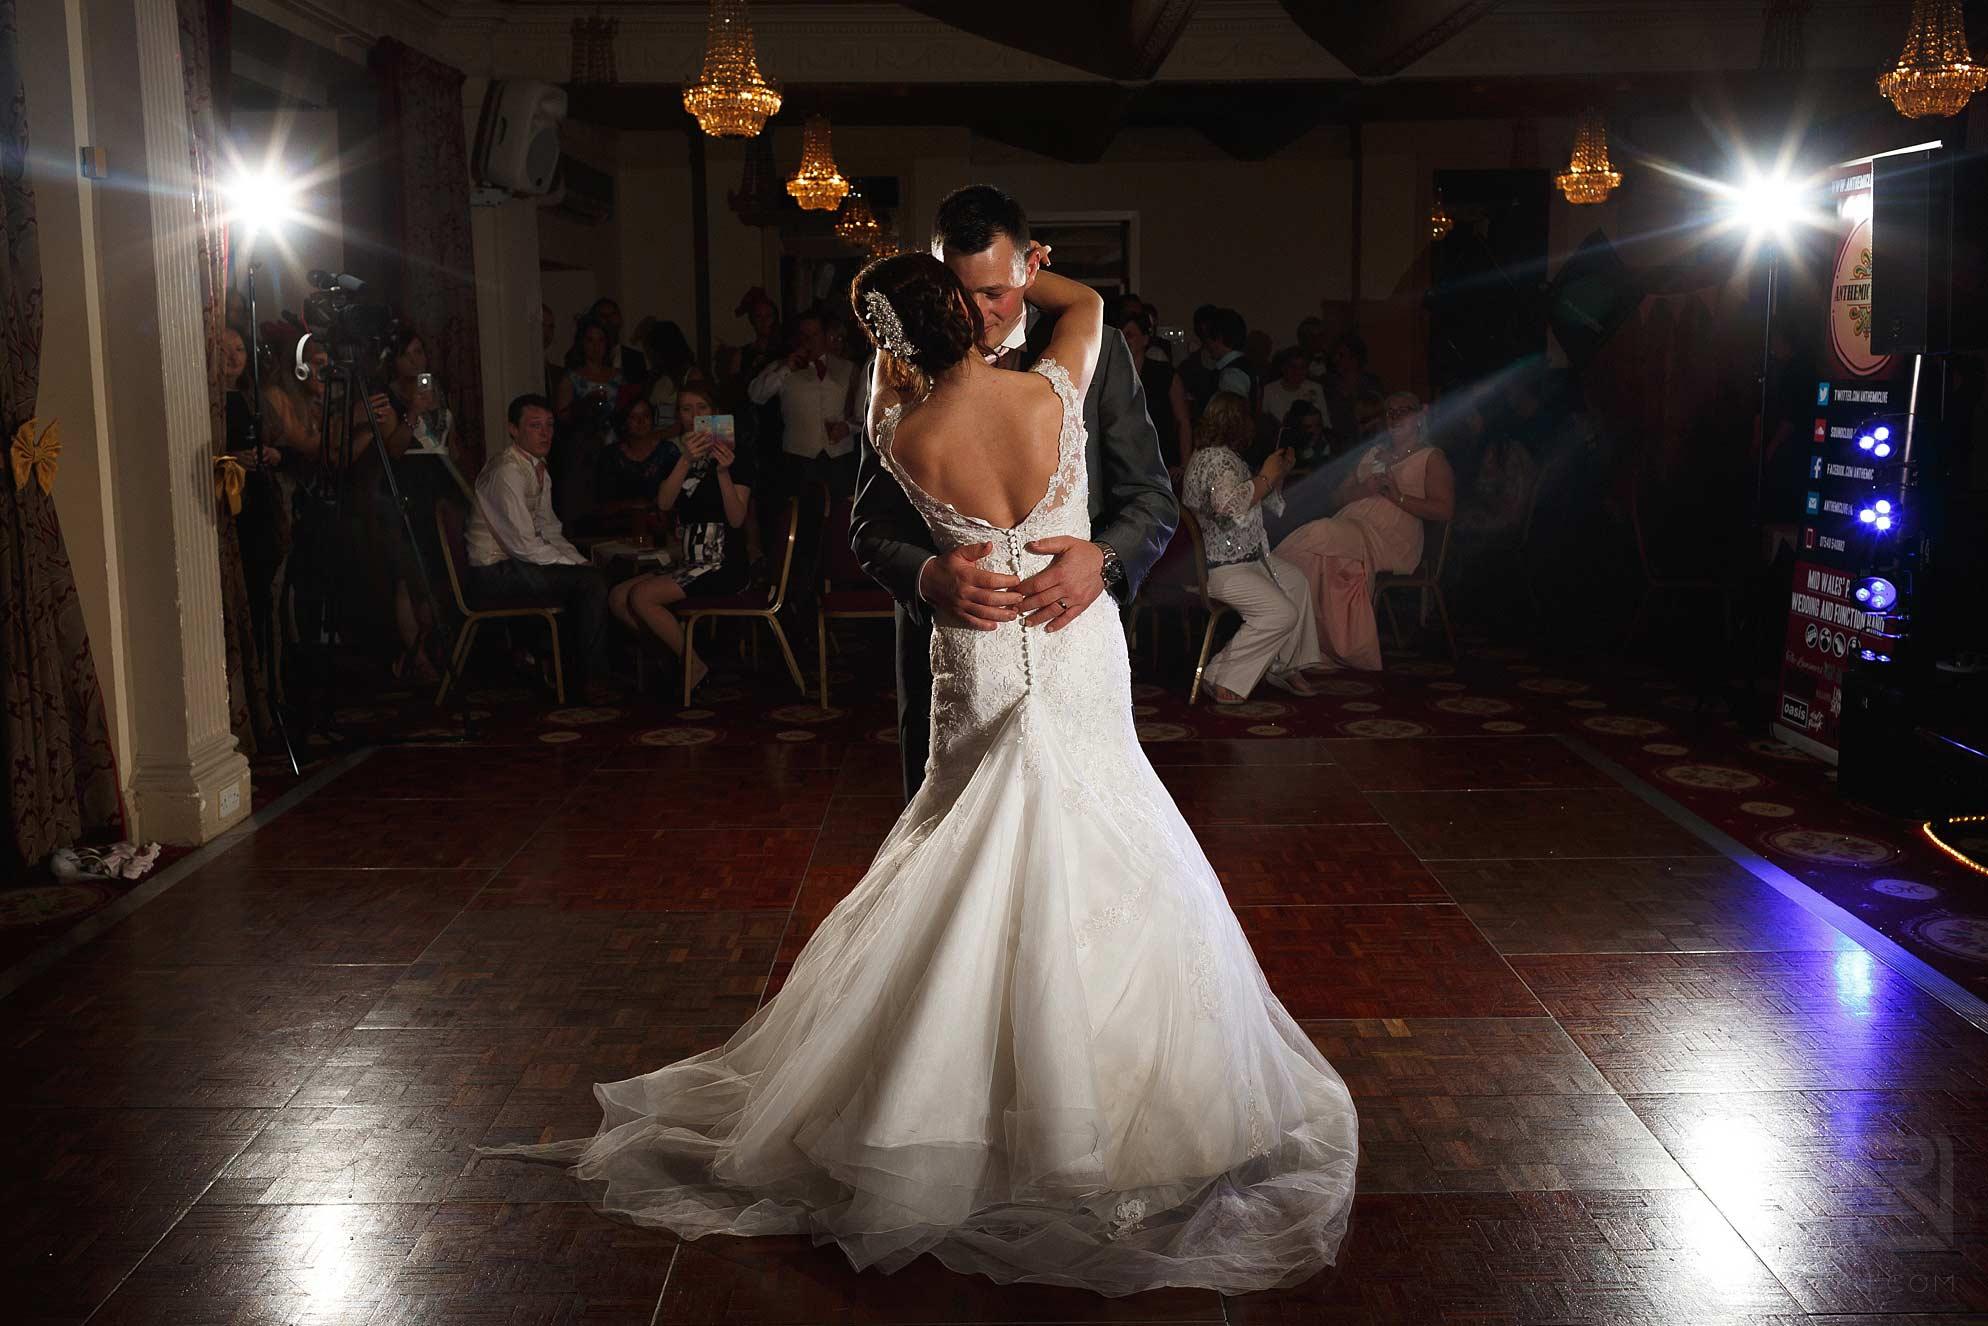 Metropole-Hotel-Llandrindod-Wells-wedding-33